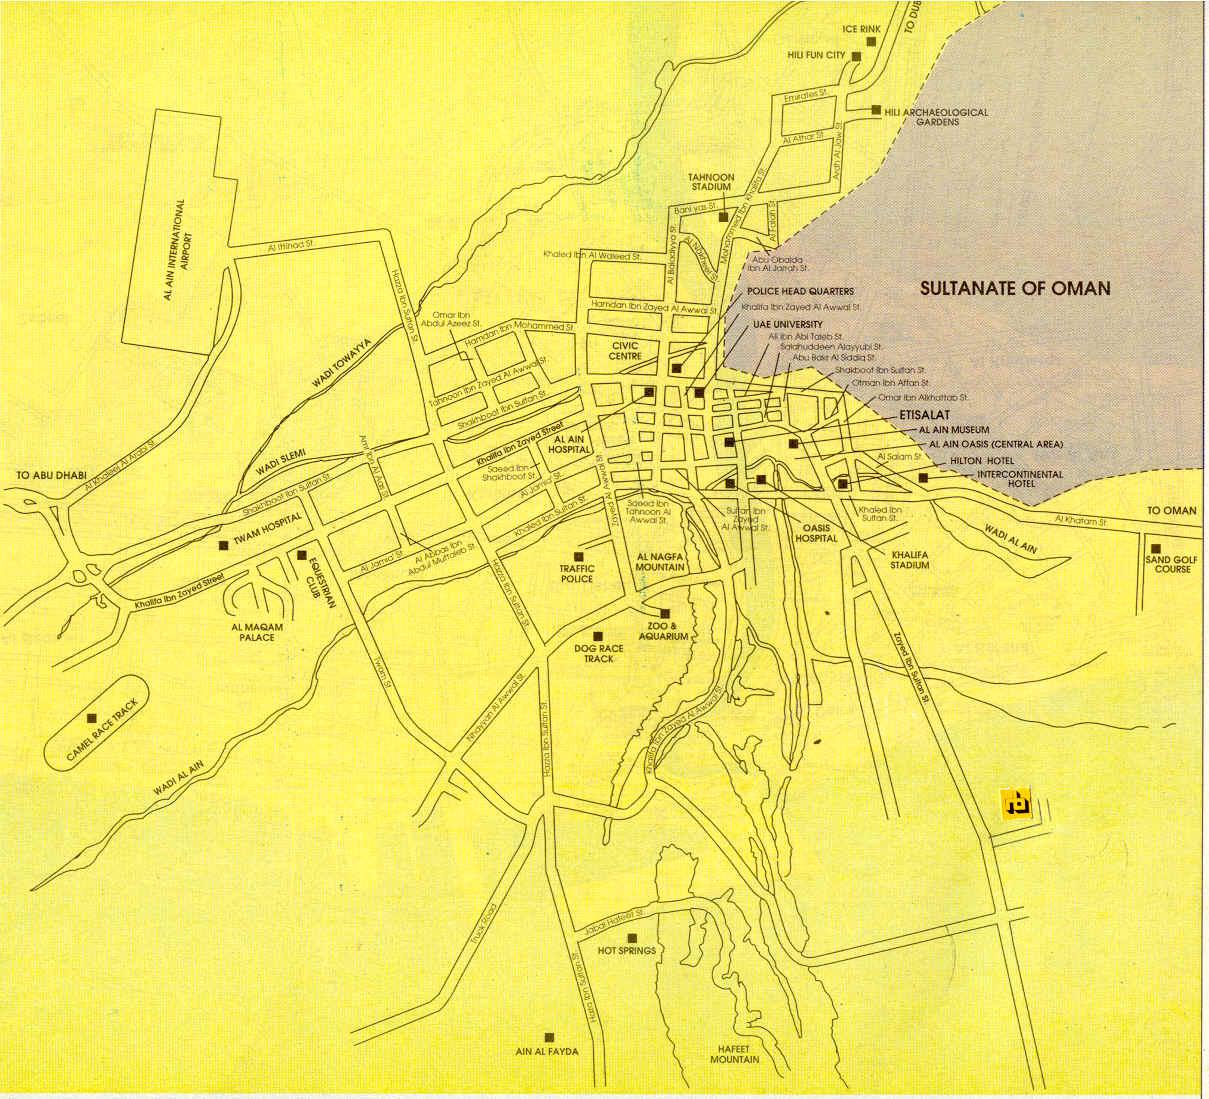 Mapa de Al Ain, Abu Dhabi EAU 7